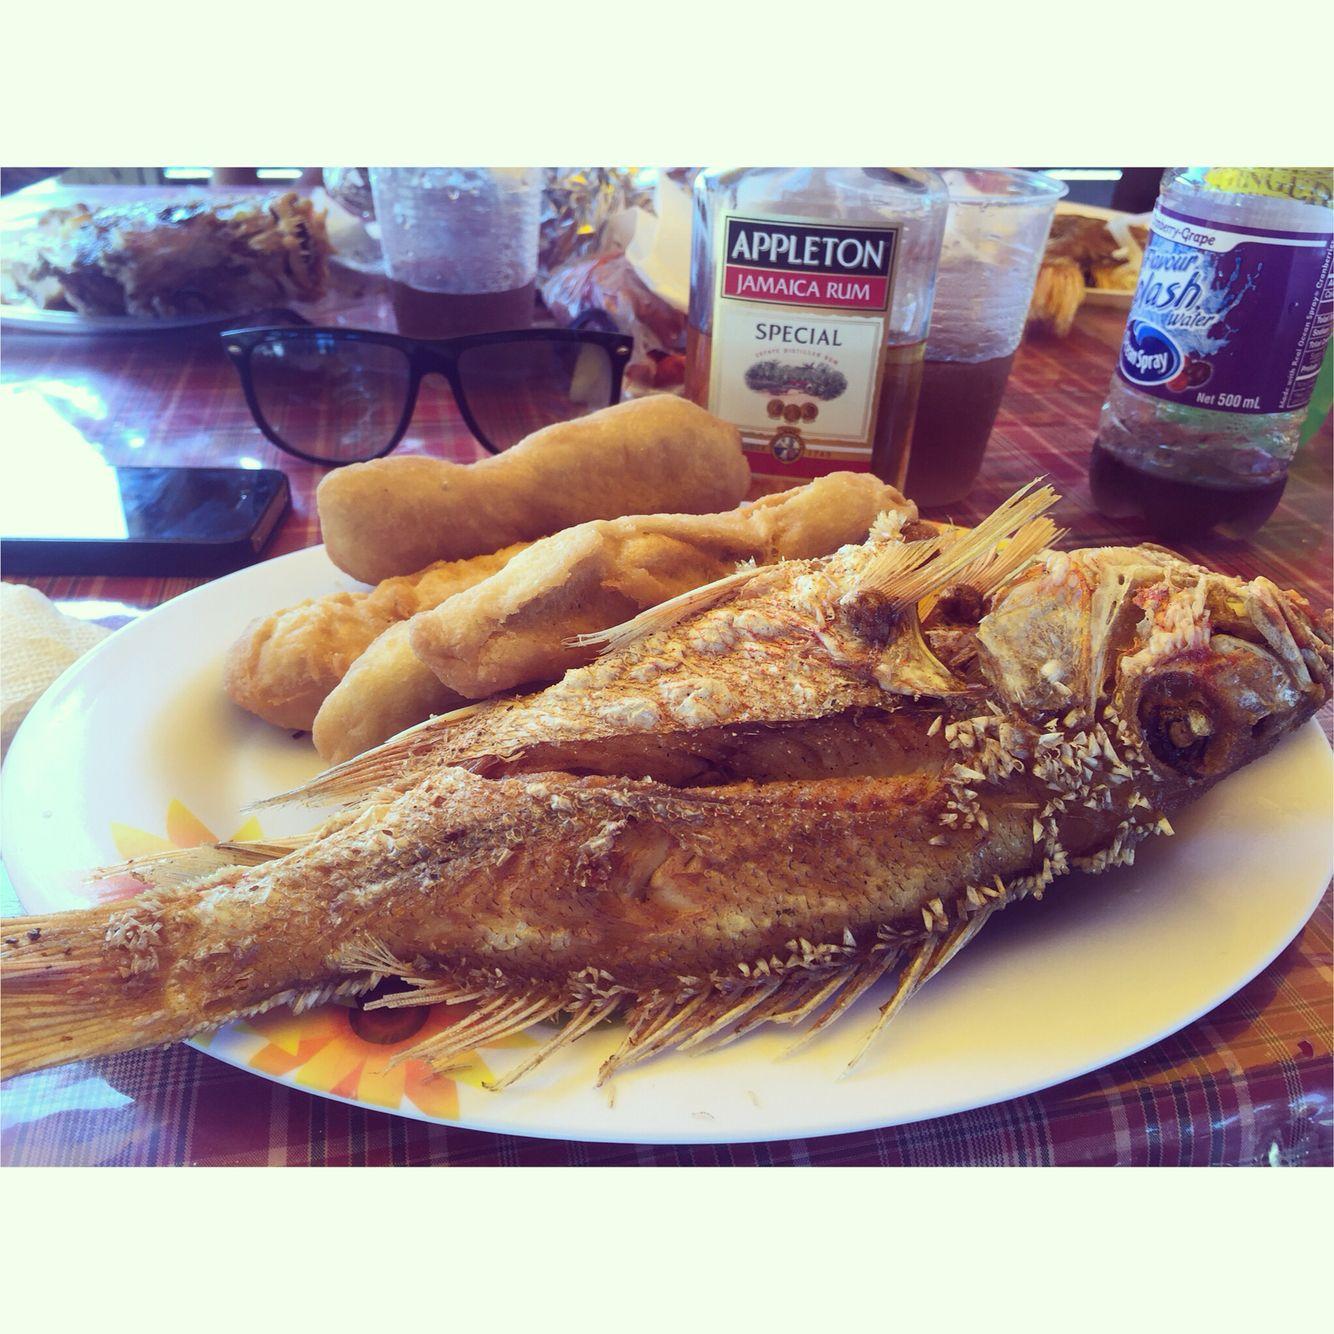 Fried Fish, Festival, and Appleton Rum at Boardwalk Beach